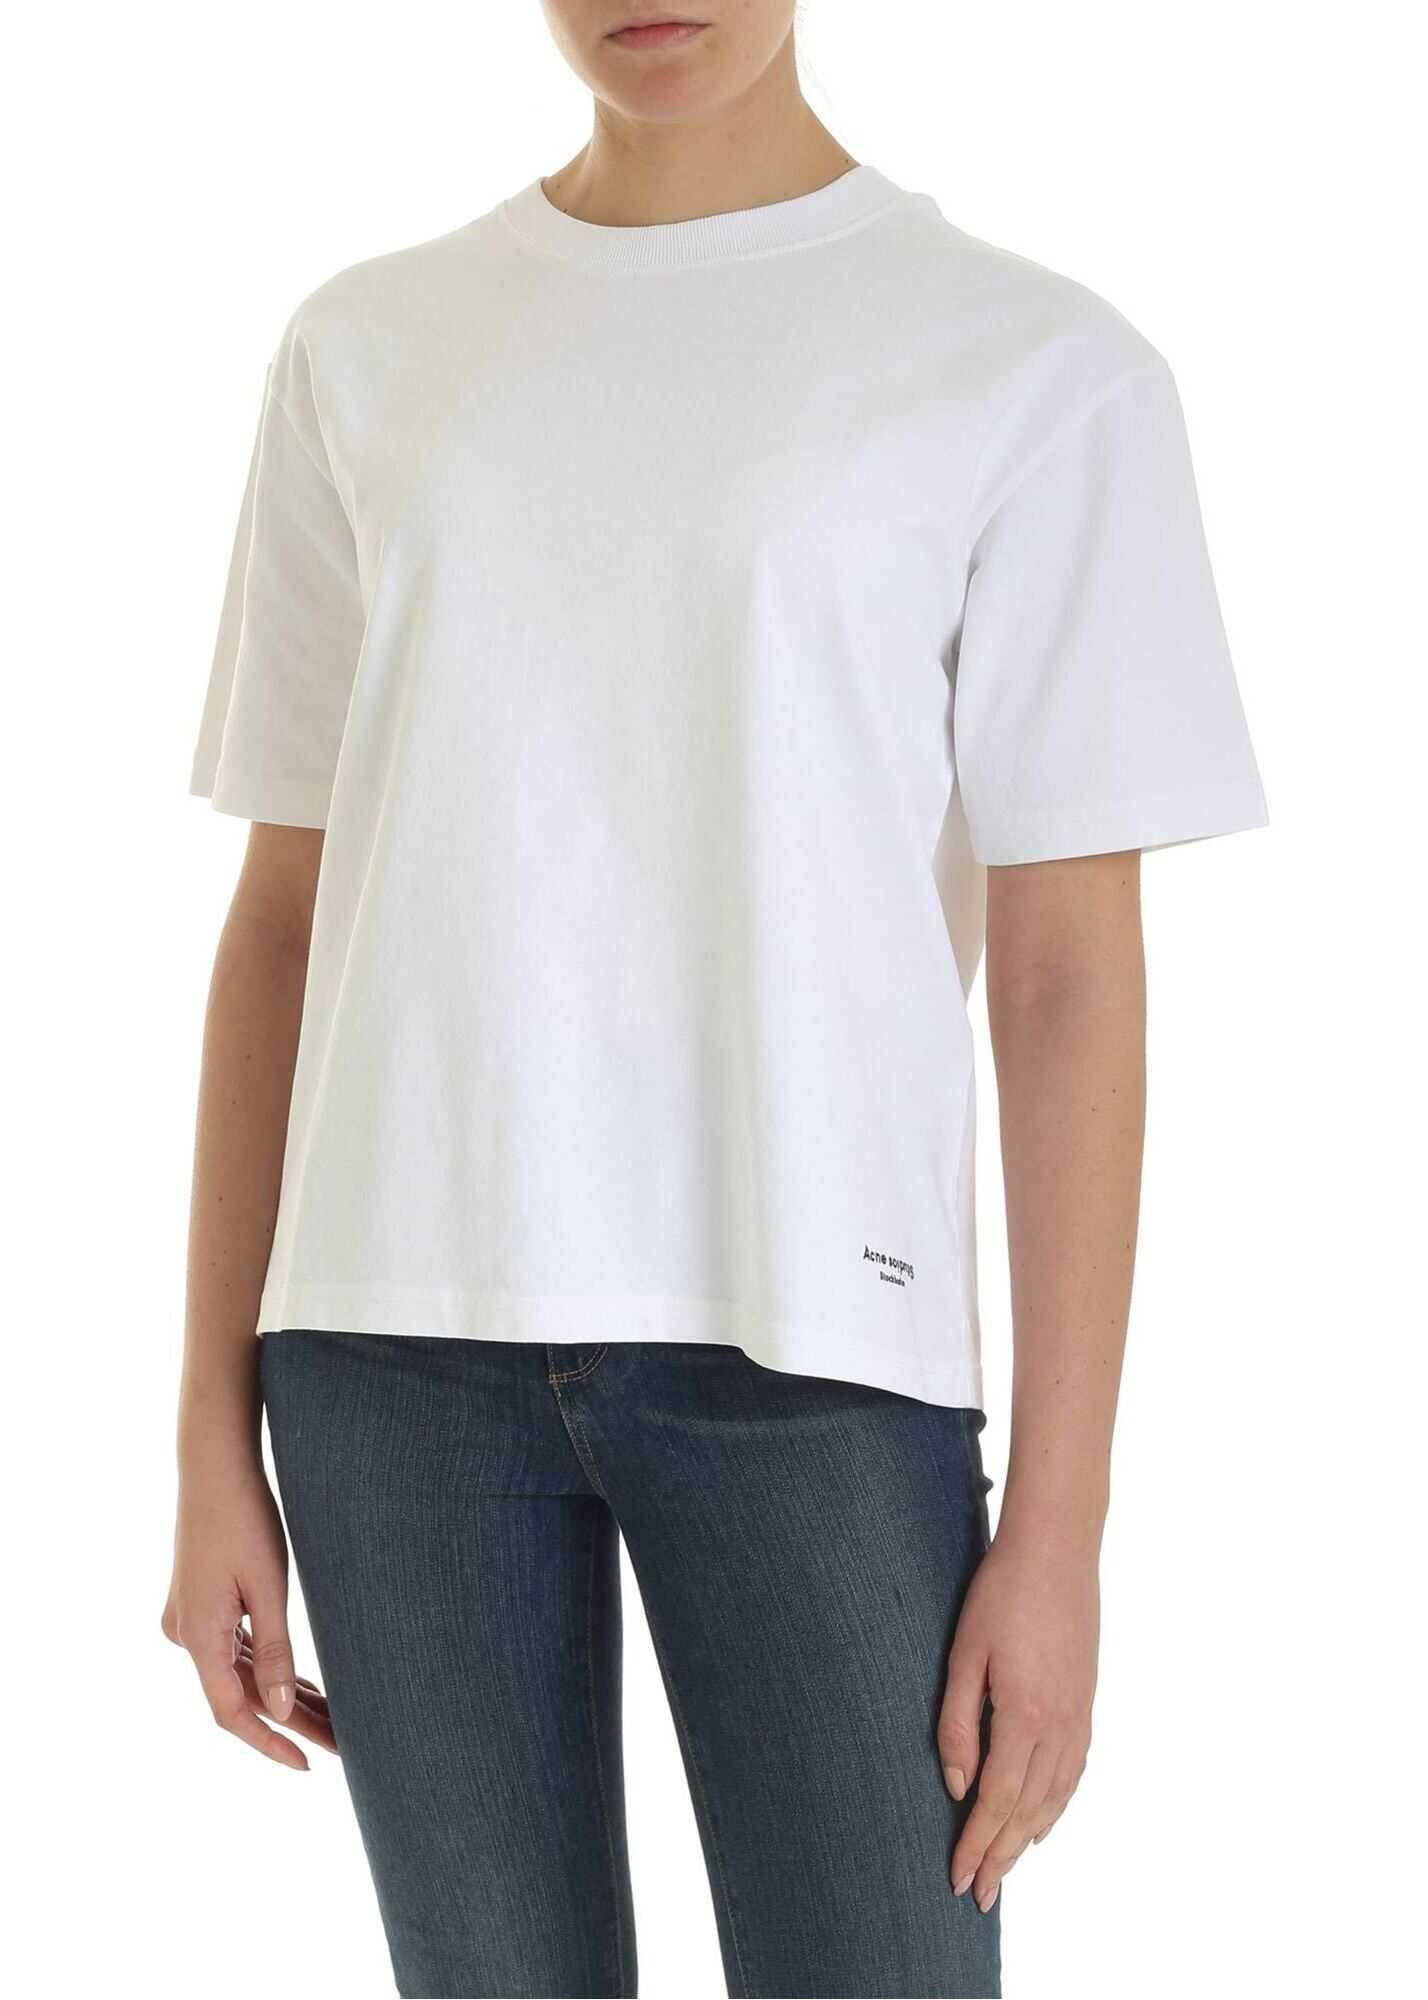 Acne Studios Contrasting Ribbon T-Shirt In White White